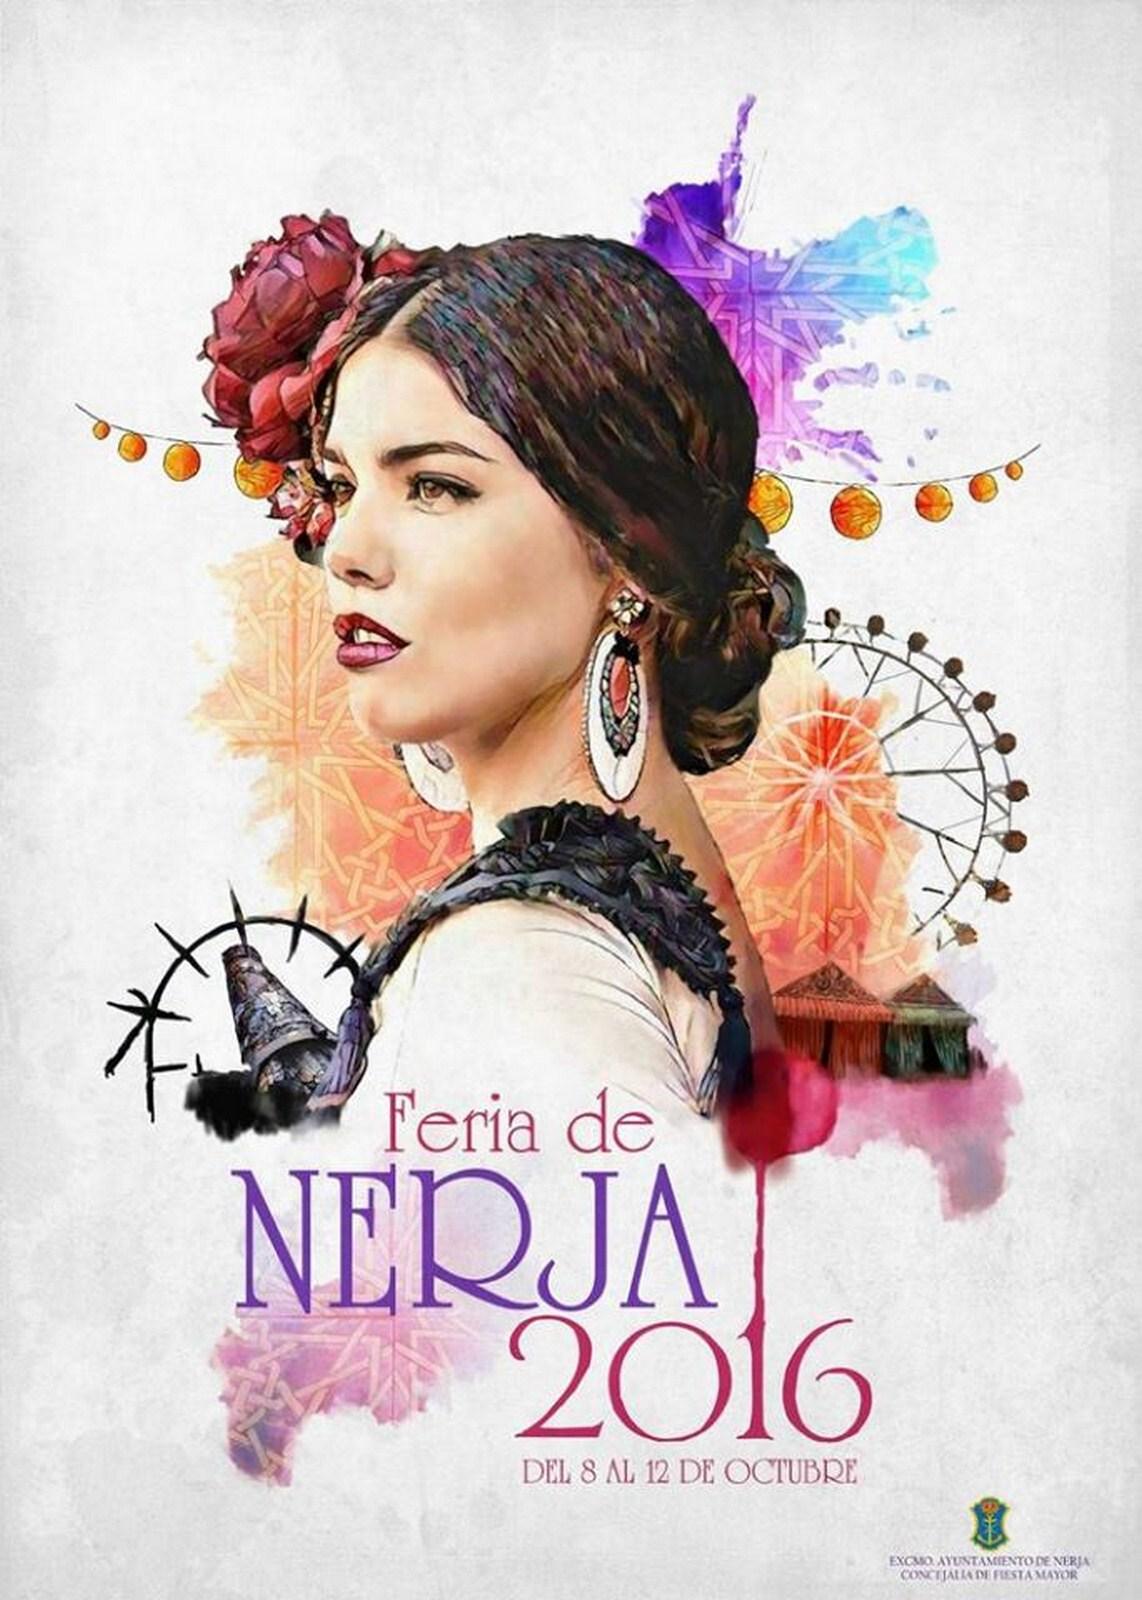 beb77a640d FERIA DE NERJA 2016 - Flamencura - Juan Francisco Castro Fernández -  Modelo  Gabriela Merino